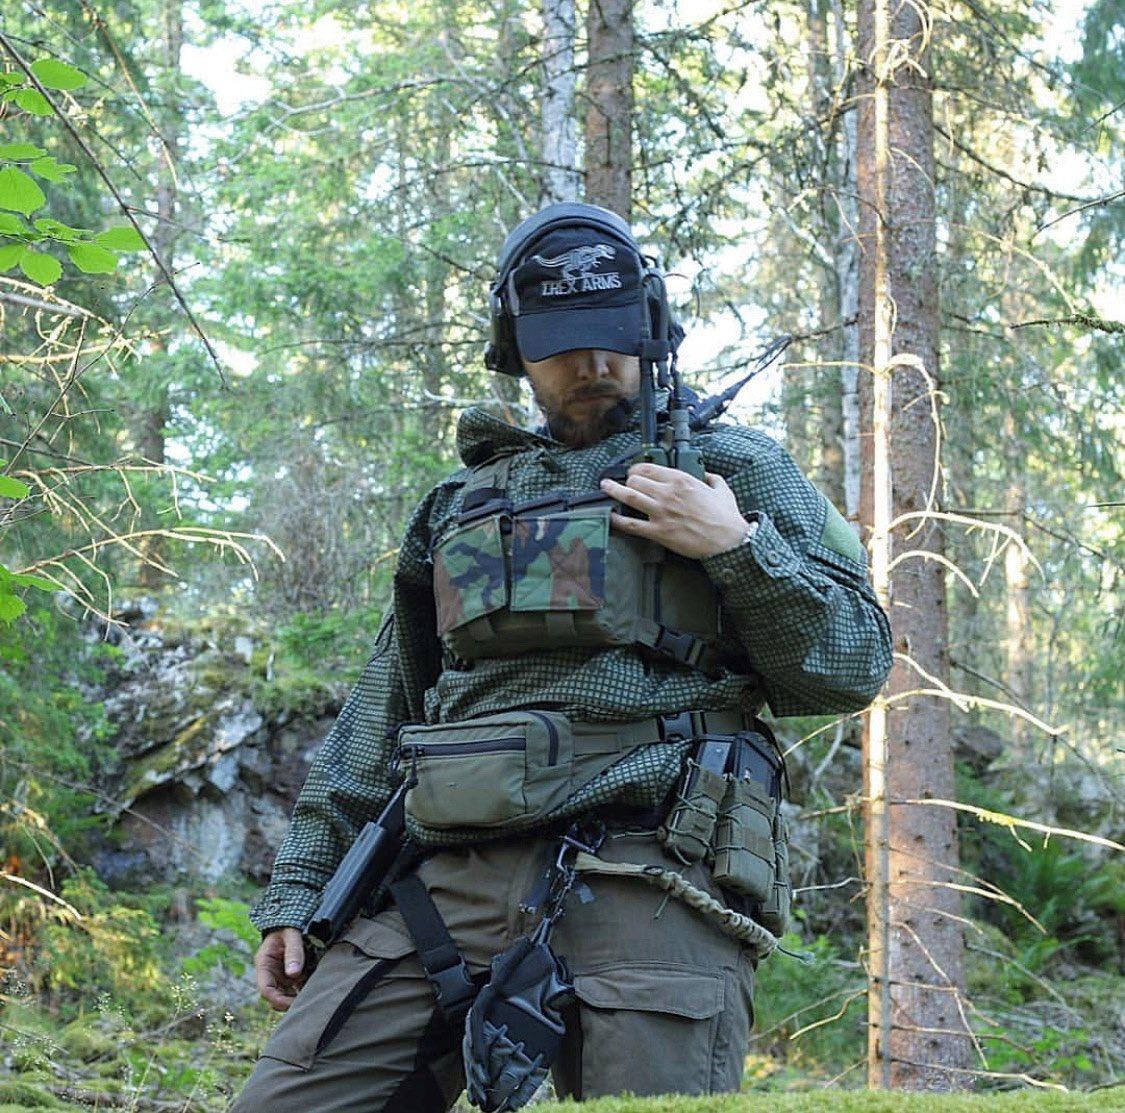 Time to radio in to announce: hunting season is amongst us. Are you ready? |📷: @rikard.nordicviking|  • • • #taco #highspeed #highspeedgear #HSGI #theoriginaltaco #OGTaco #realworld #hunting #shooting #huntingseason #rifle #rifles #shotgun #hunter #hunterxhunter https://t.co/VcfTBCd1oZ